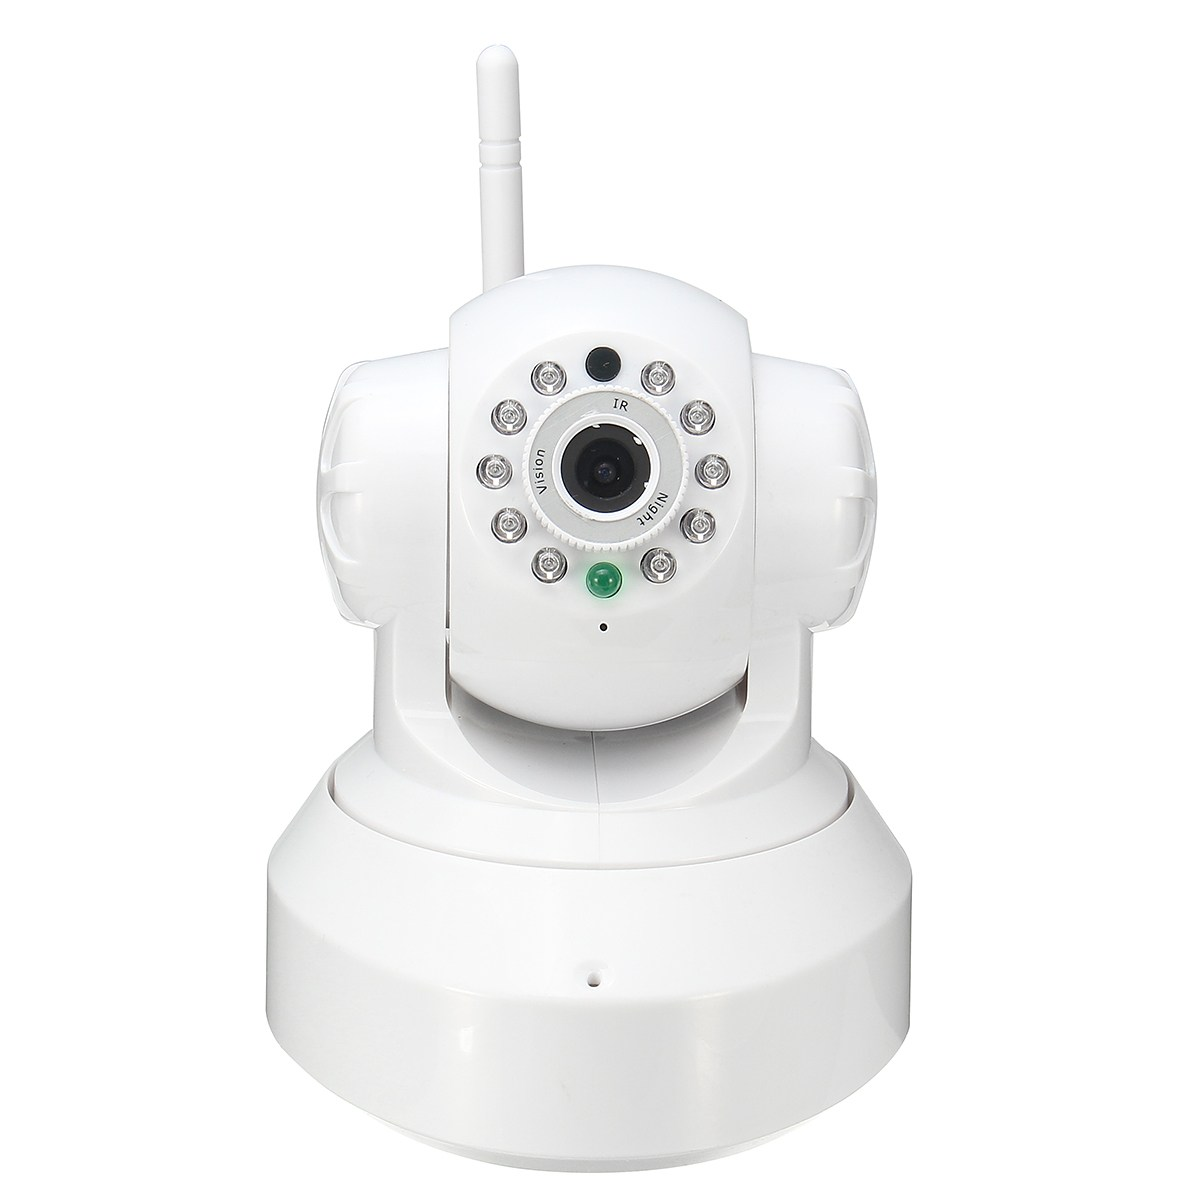 Safurance 100W 720P HD Intelligent Wireless WiFi IP Camera Home Security WiFi Night Vision Baby Monitor Surveillance Safety safurance mini wireless network wifi ip camera security nanny night vision cam surveillance home security